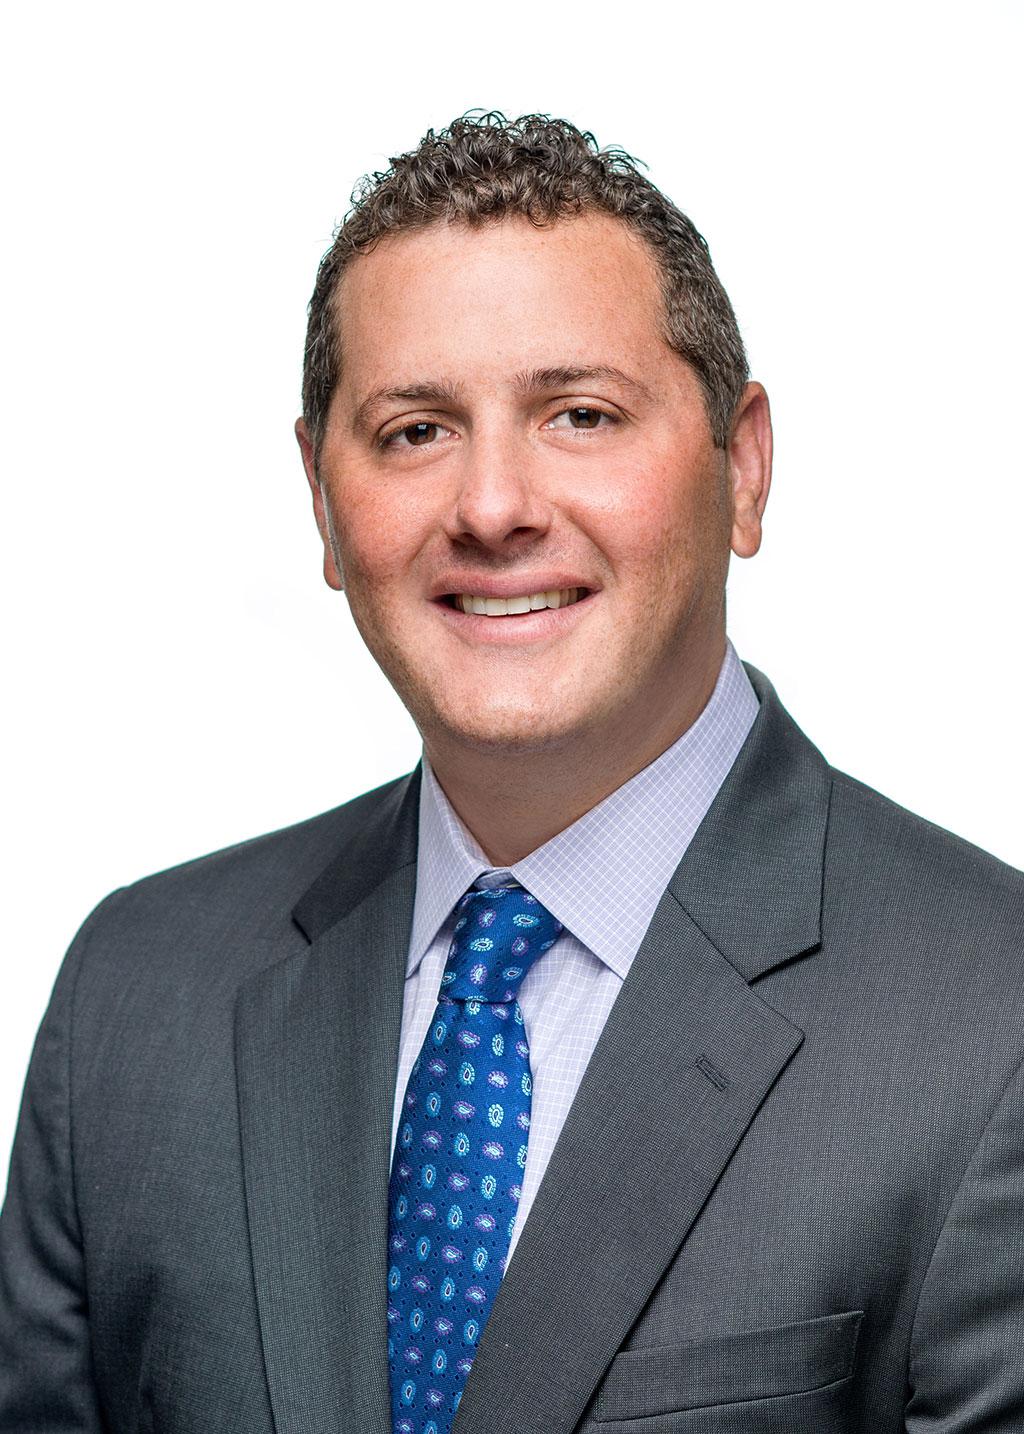 Brian Alster